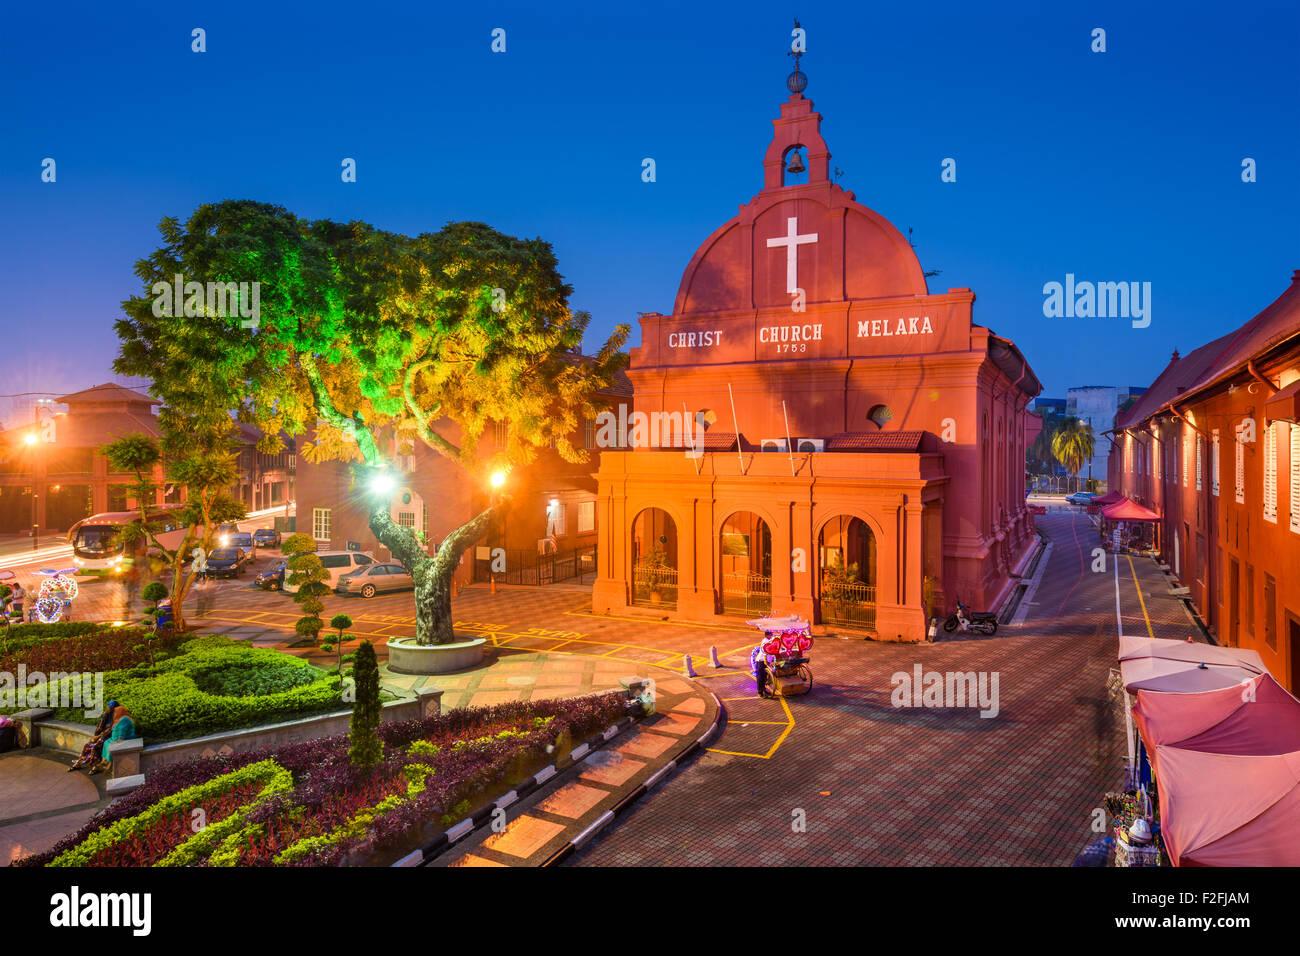 La Iglesia de Cristo en Malacca Melaka, Malasia. Imagen De Stock